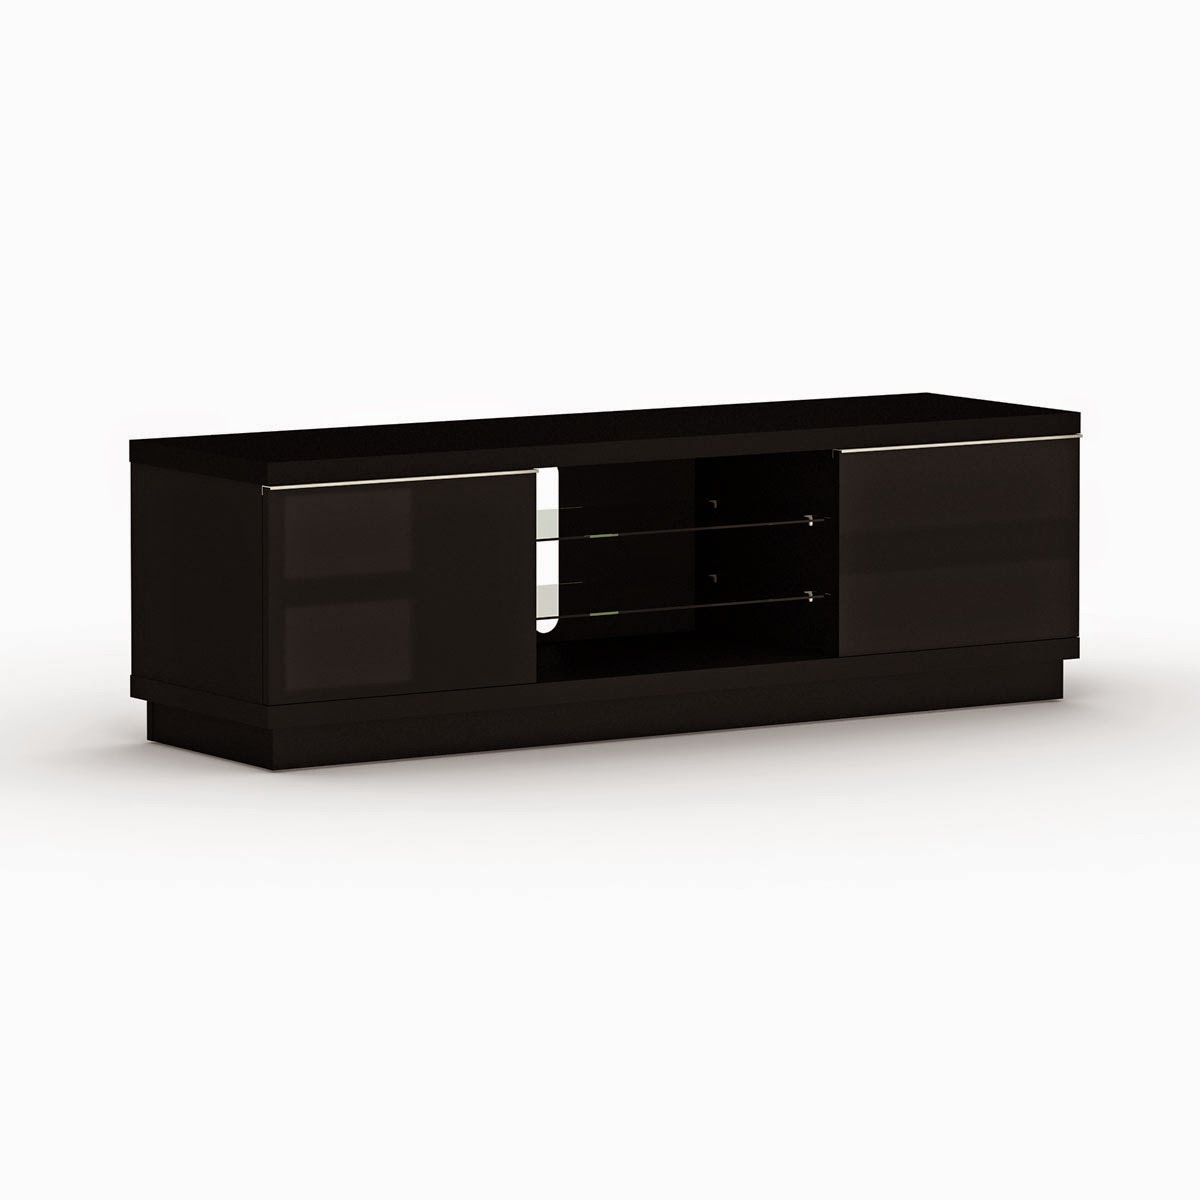 Meuble Tv Laque Noir Ikea Conceptions De Maison Blanzza Com # Meuble Ikea Noir Laque